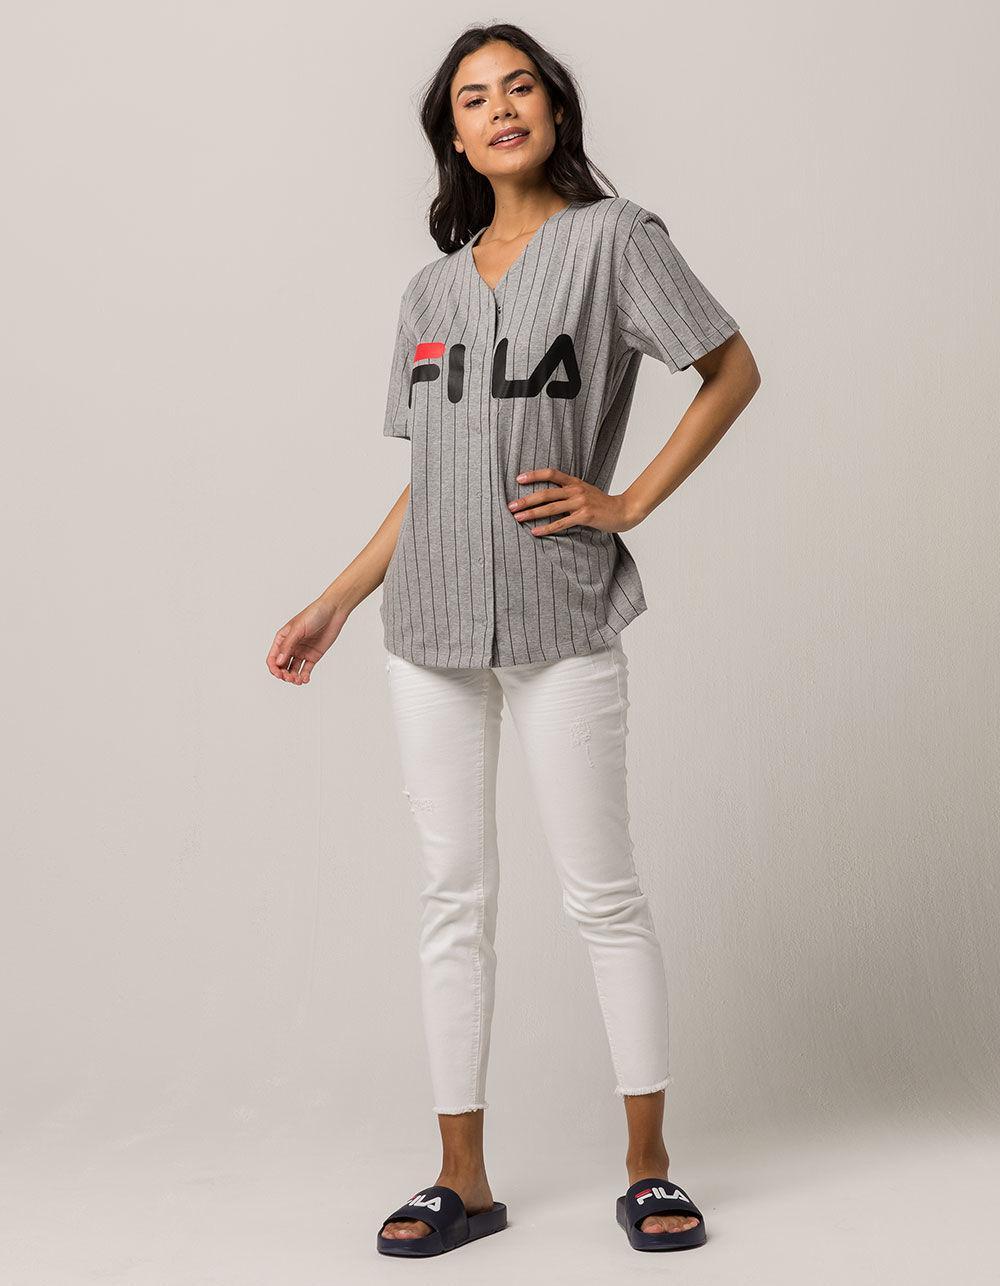 e687148c5008 Lyst - Fila Lacey Womens Baseball Jersey in Gray